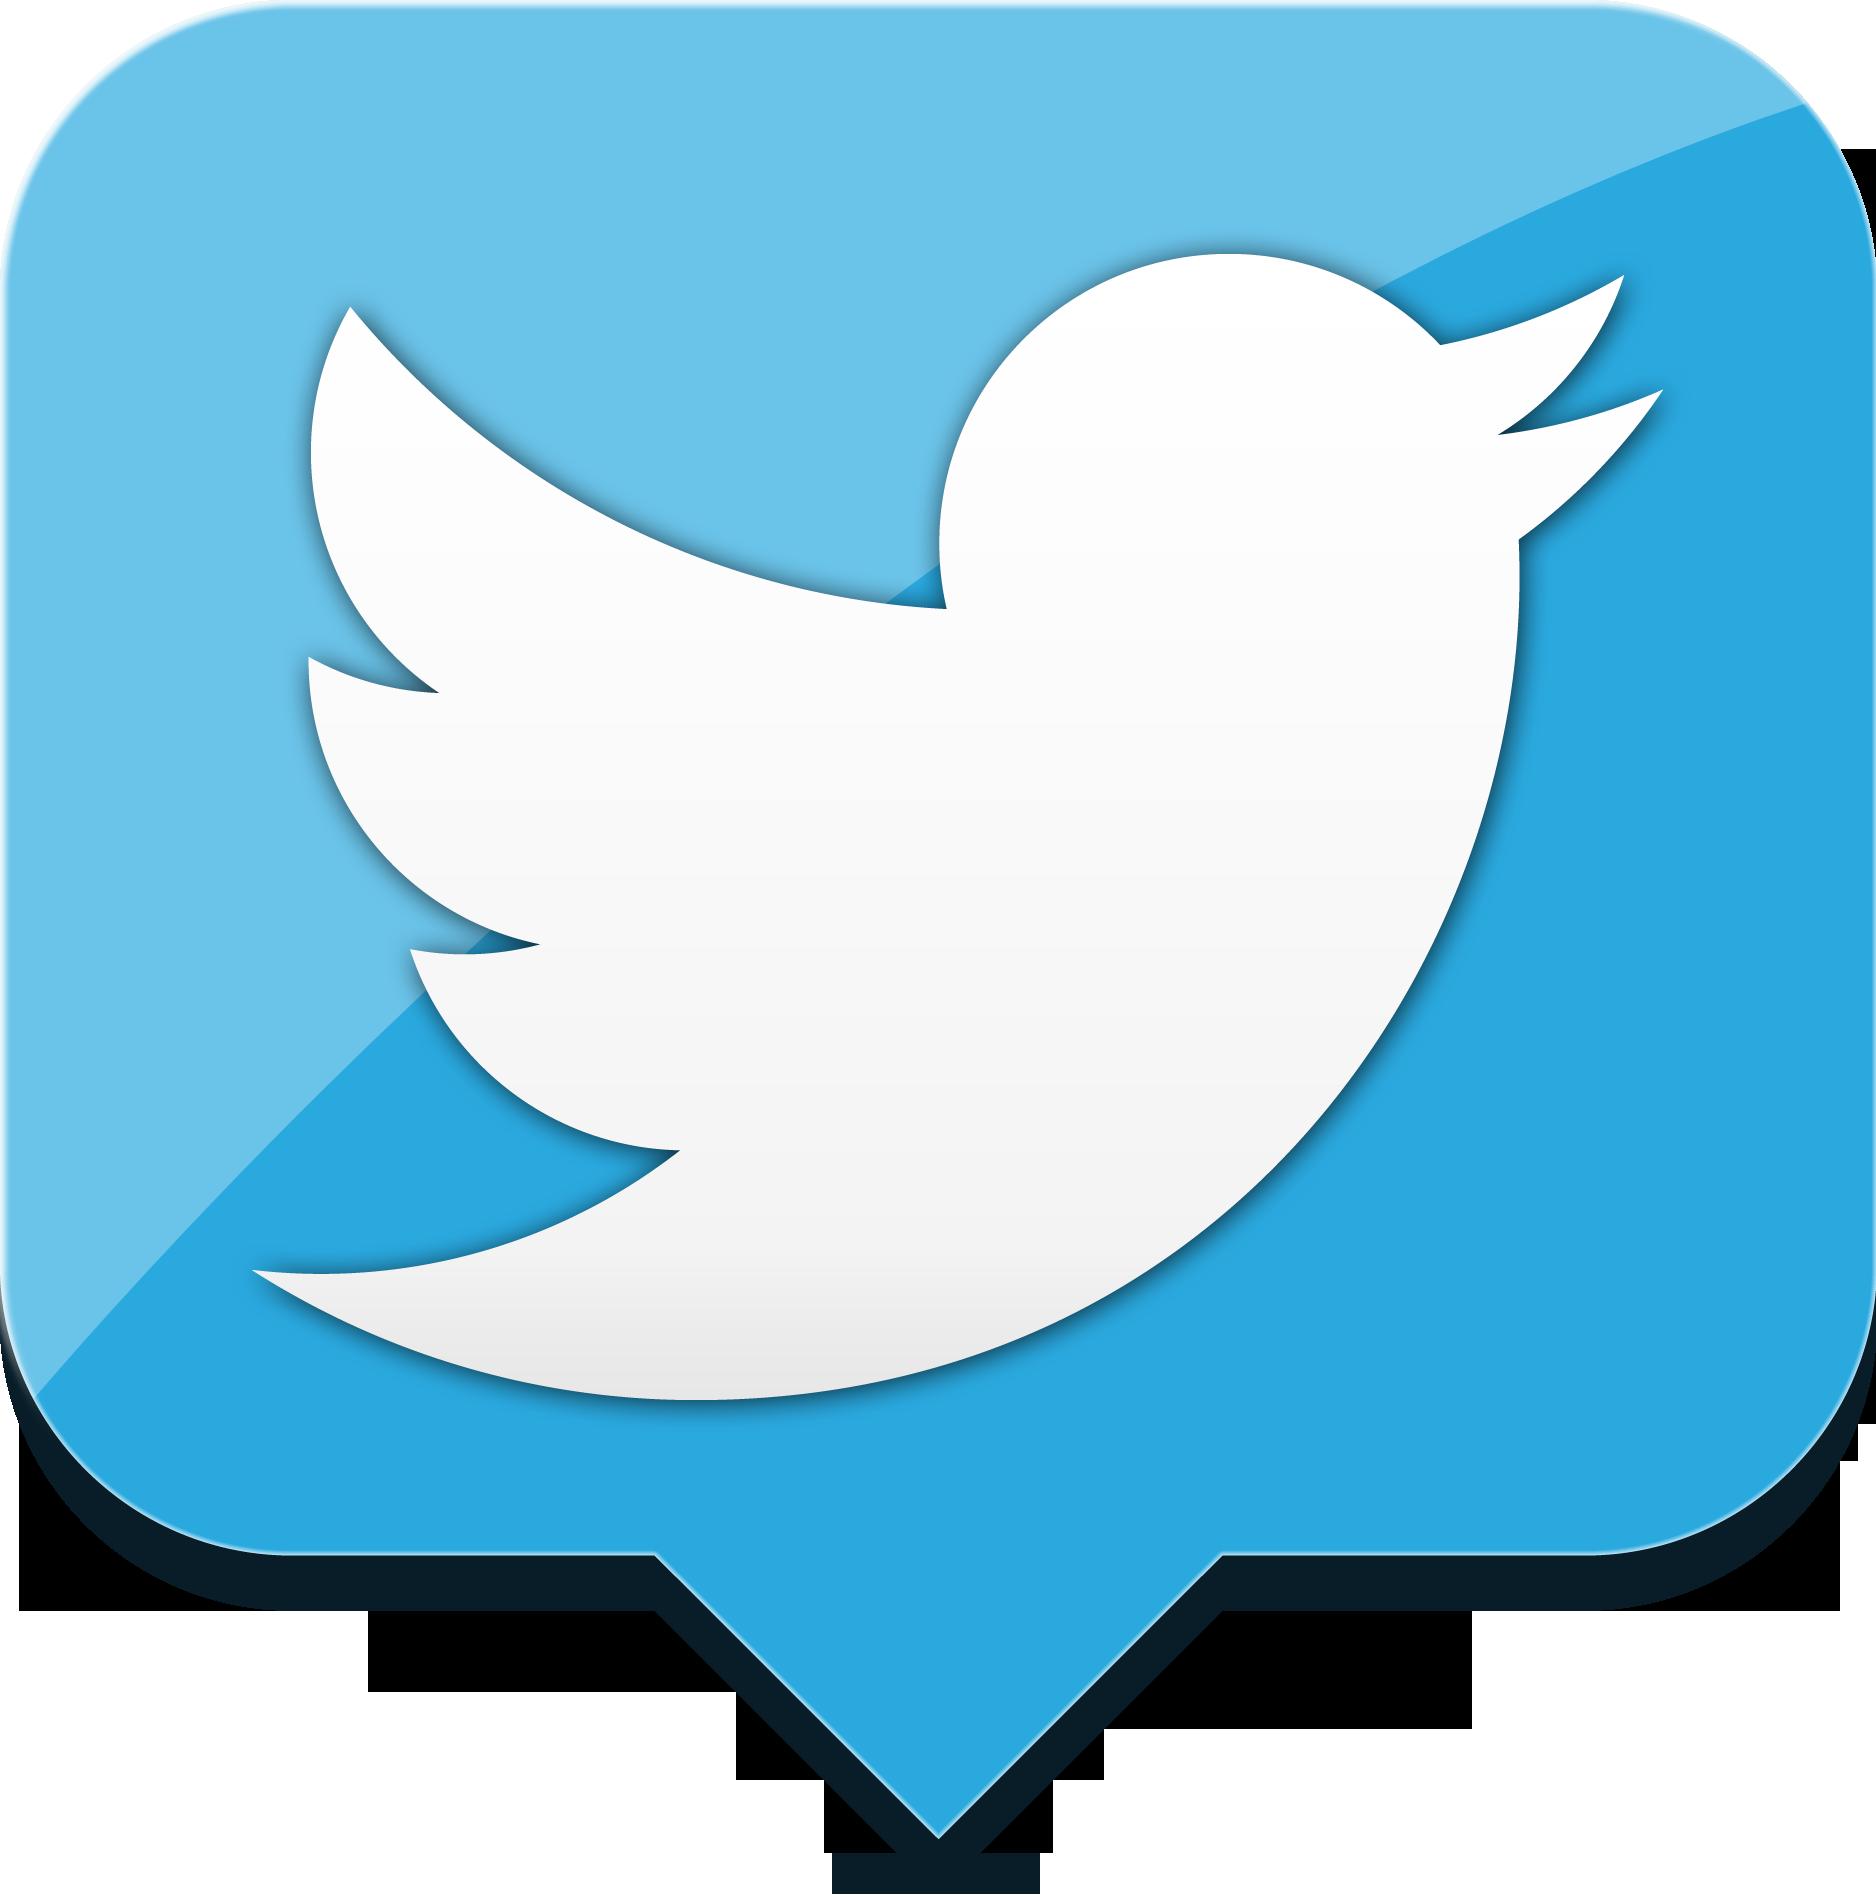 Crimes And Social Media